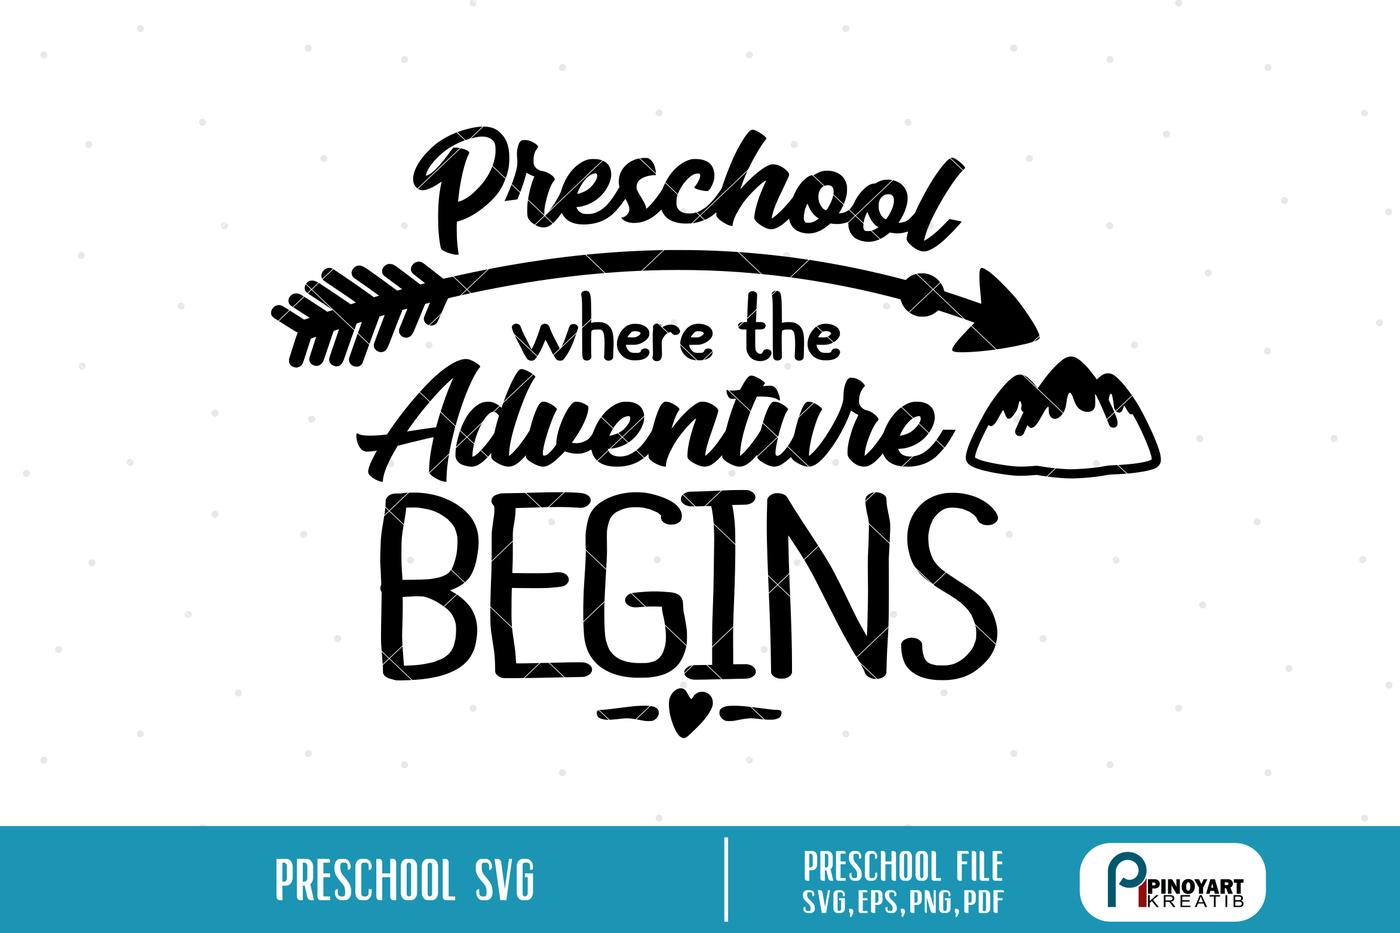 preschool svg #1029, Download drawings